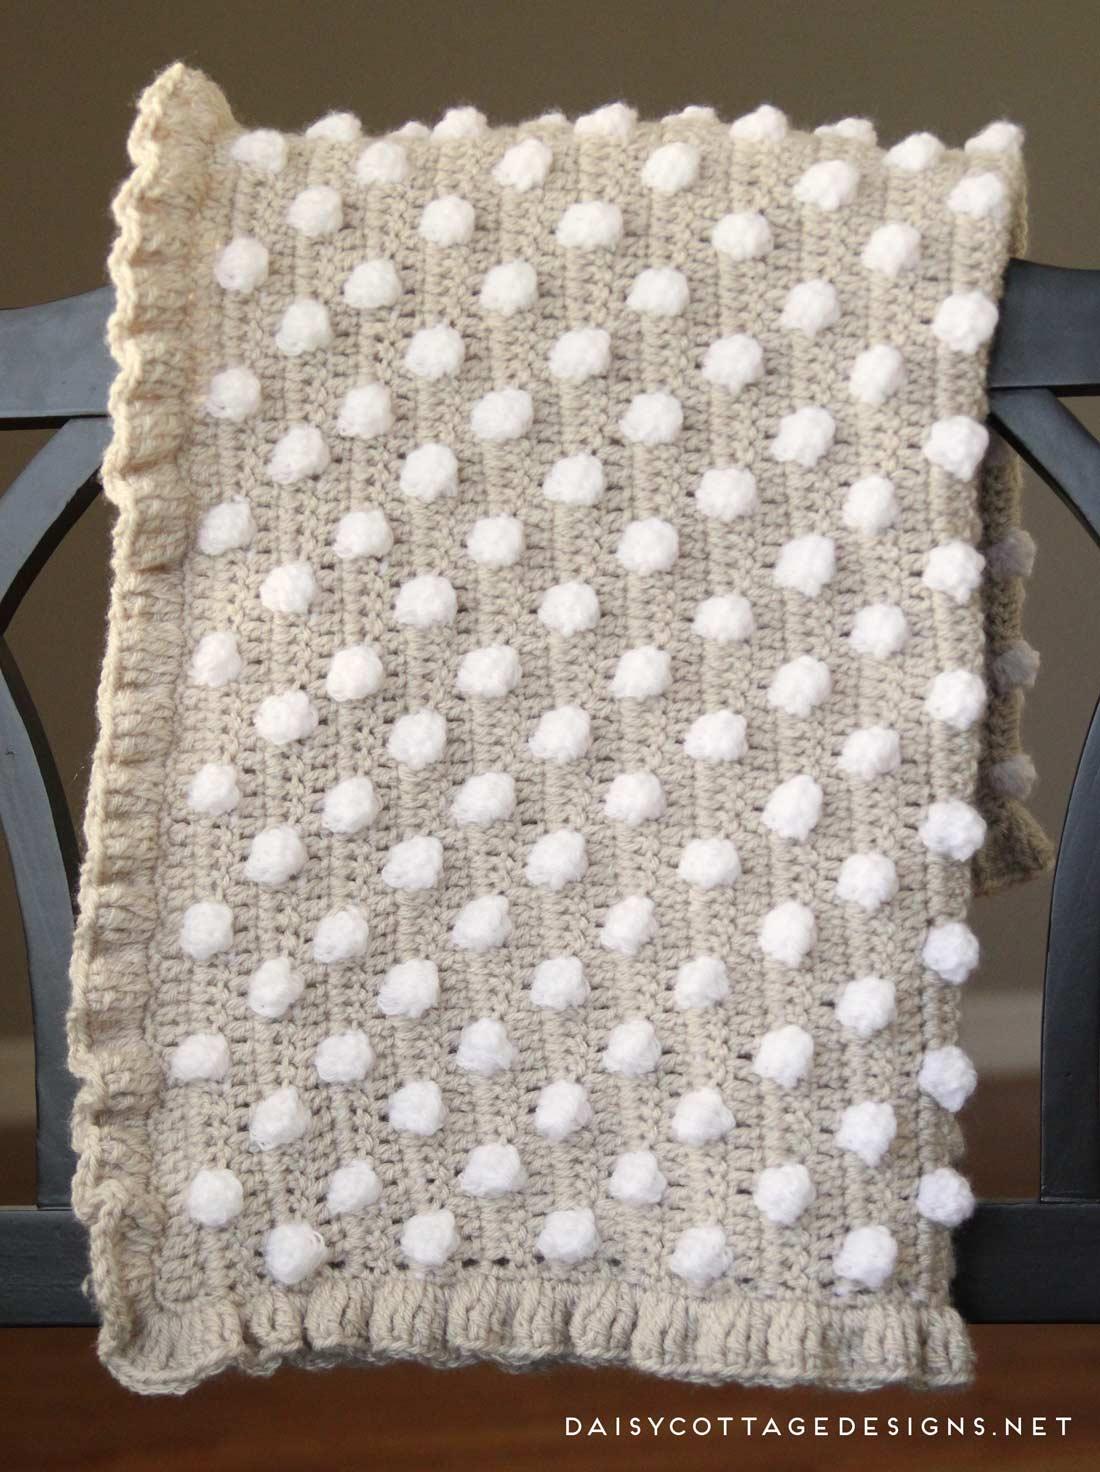 free crochet pattern | crochet blanket pattern | crochet baby blanket | uaxvjhv